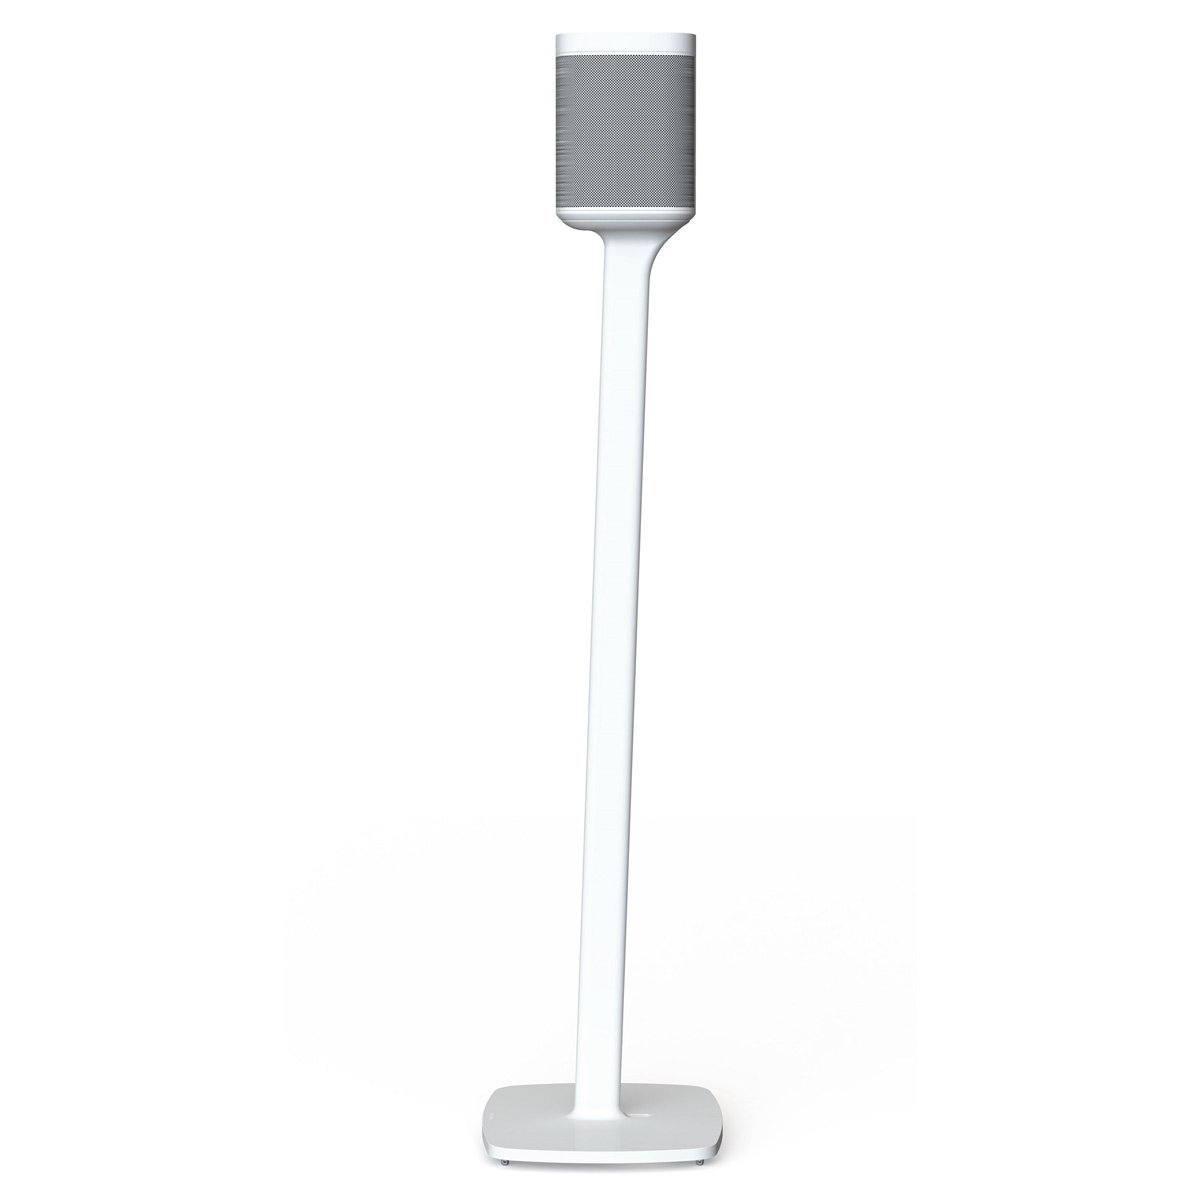 Flexson Floor Stand for Sonos One - Each (White)